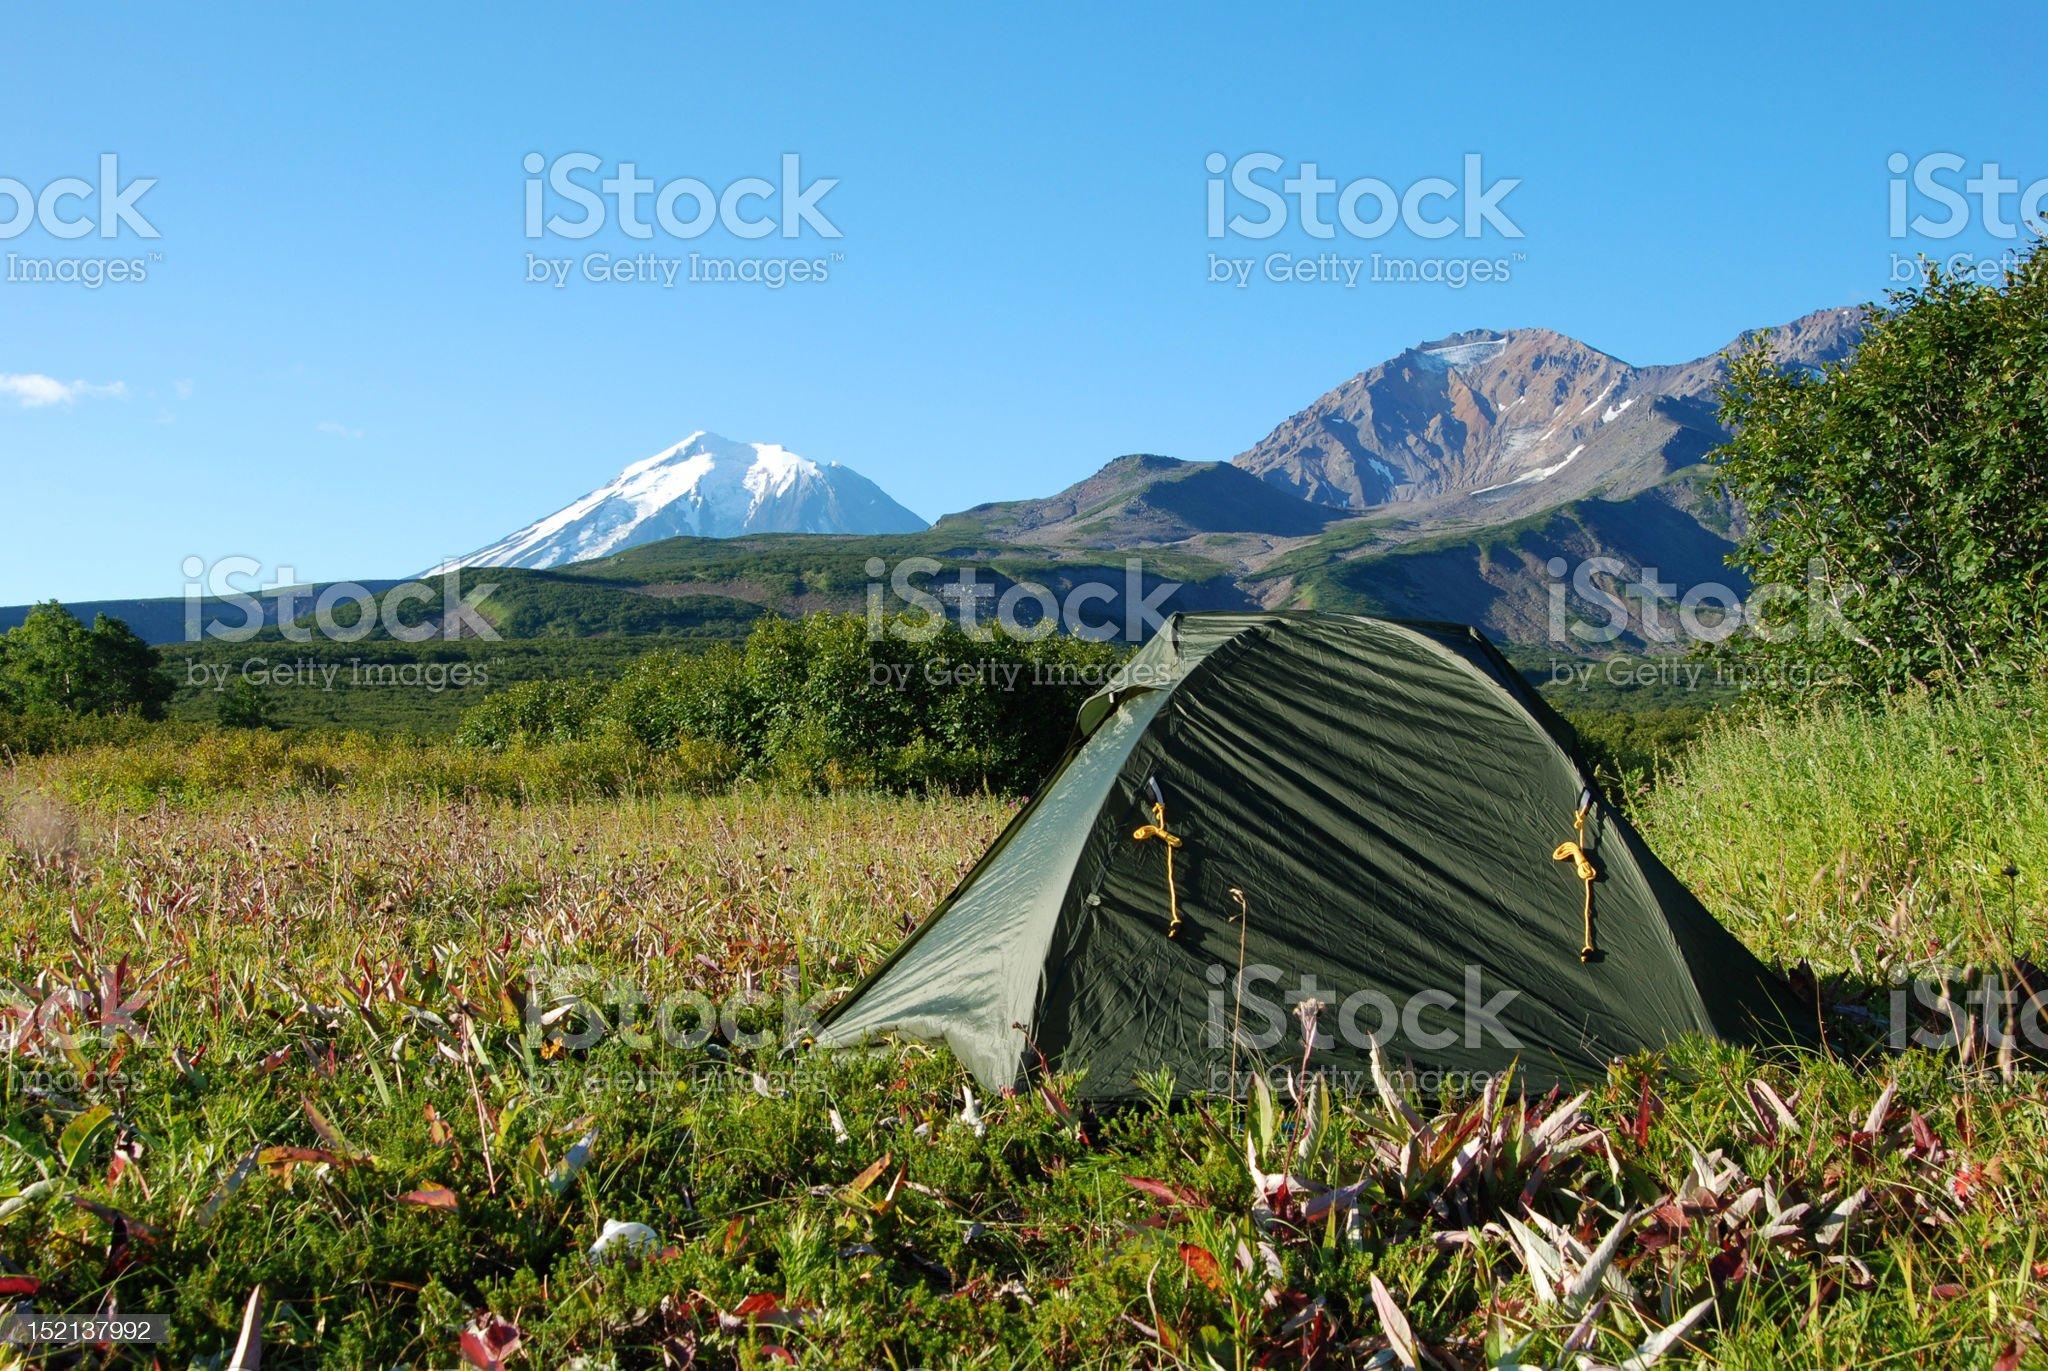 Camping royalty-free stock photo